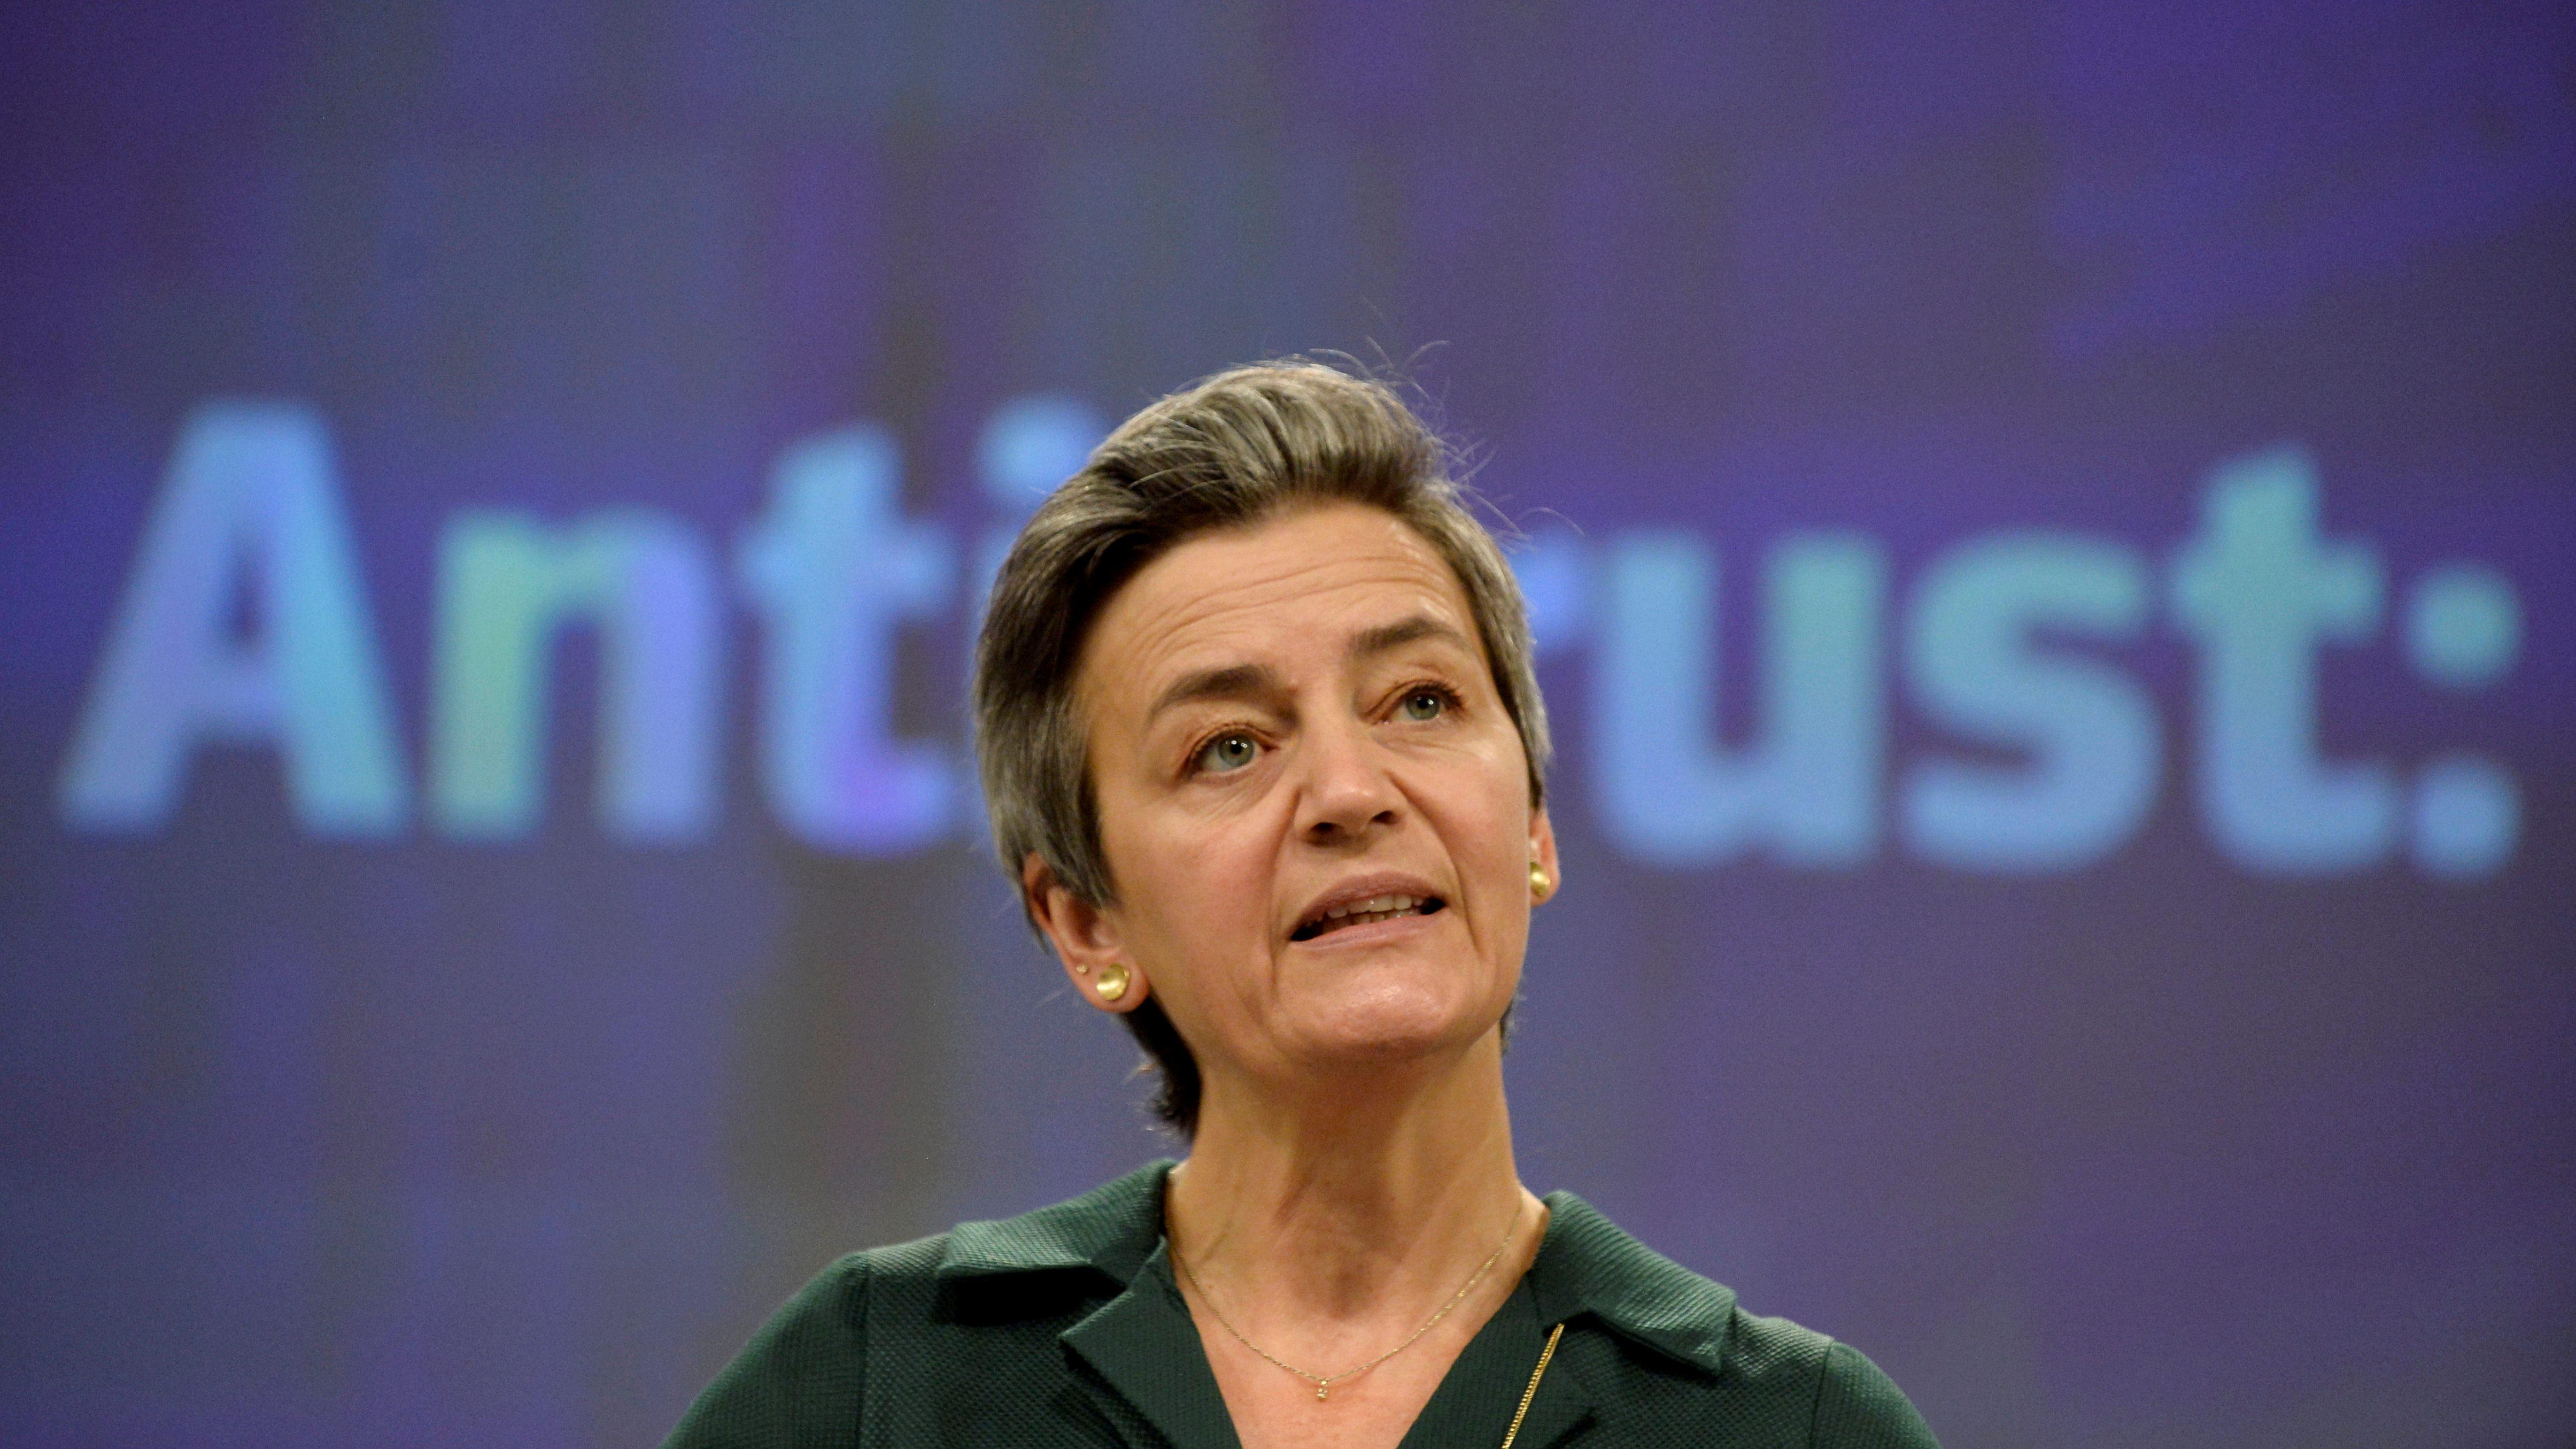 EU competition czar Margrethe Vestager speaks in front of a backdrop that says antitrust.